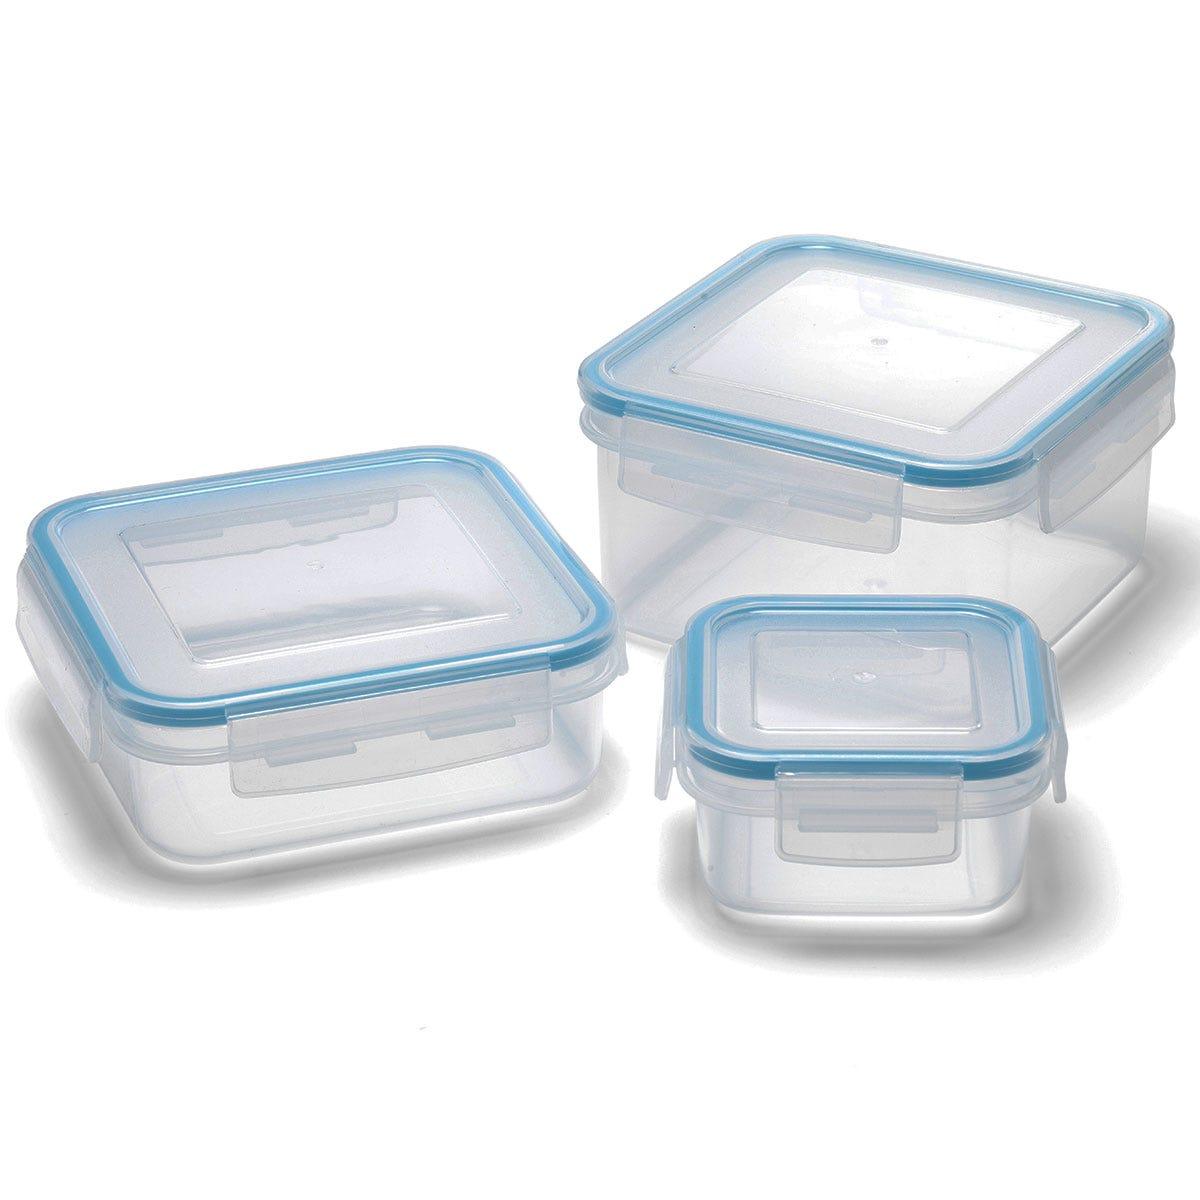 Image of Addis Clip & Close 3 Piece Square Food Container Food Set